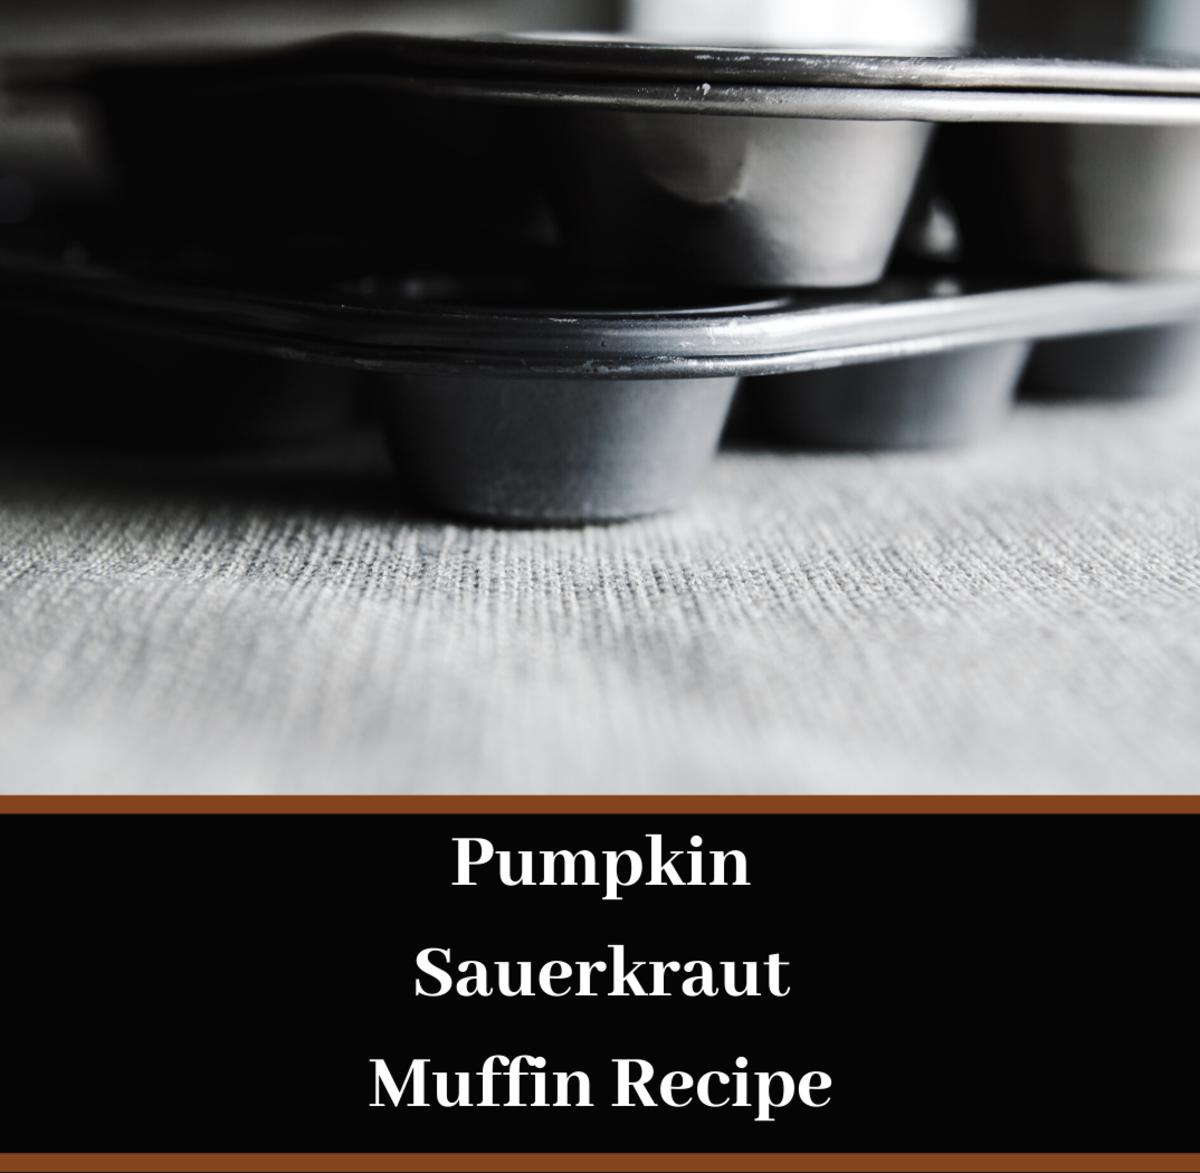 Your whole family will love this pumpkin sauerkraut muffin recipe.